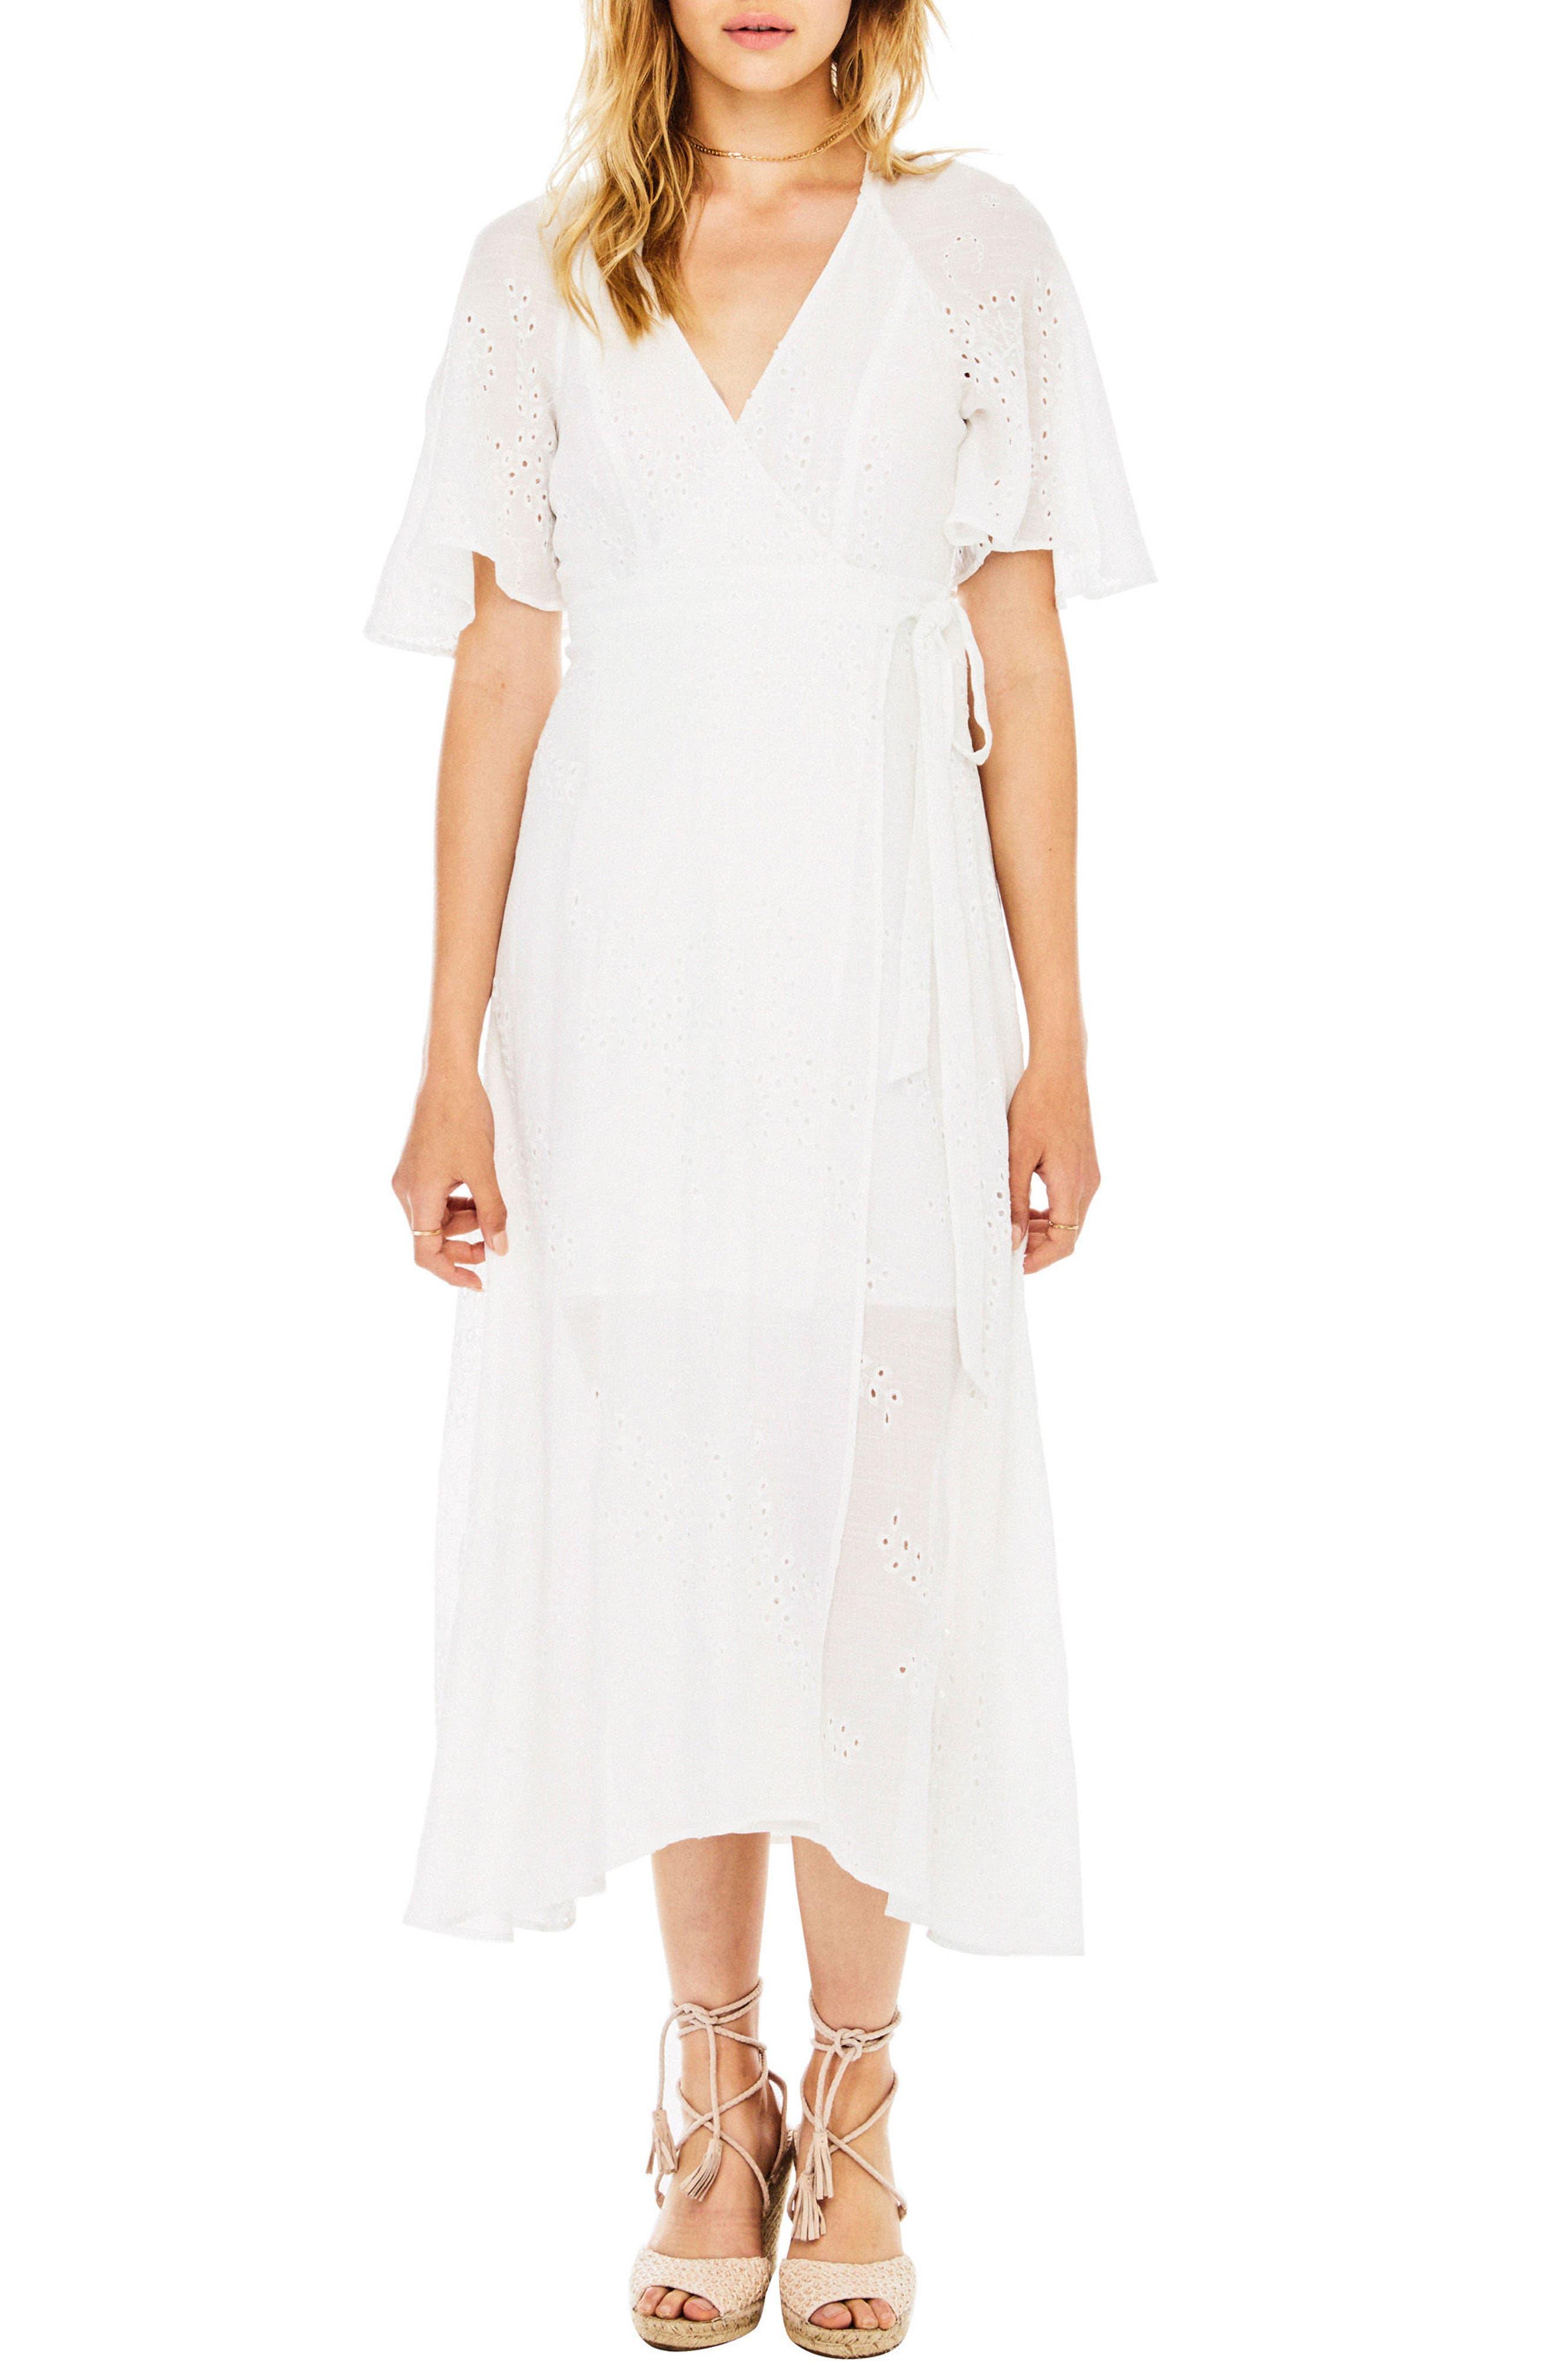 Gretchen Eyelet Wrap Dress,                         Main,                         color, 100